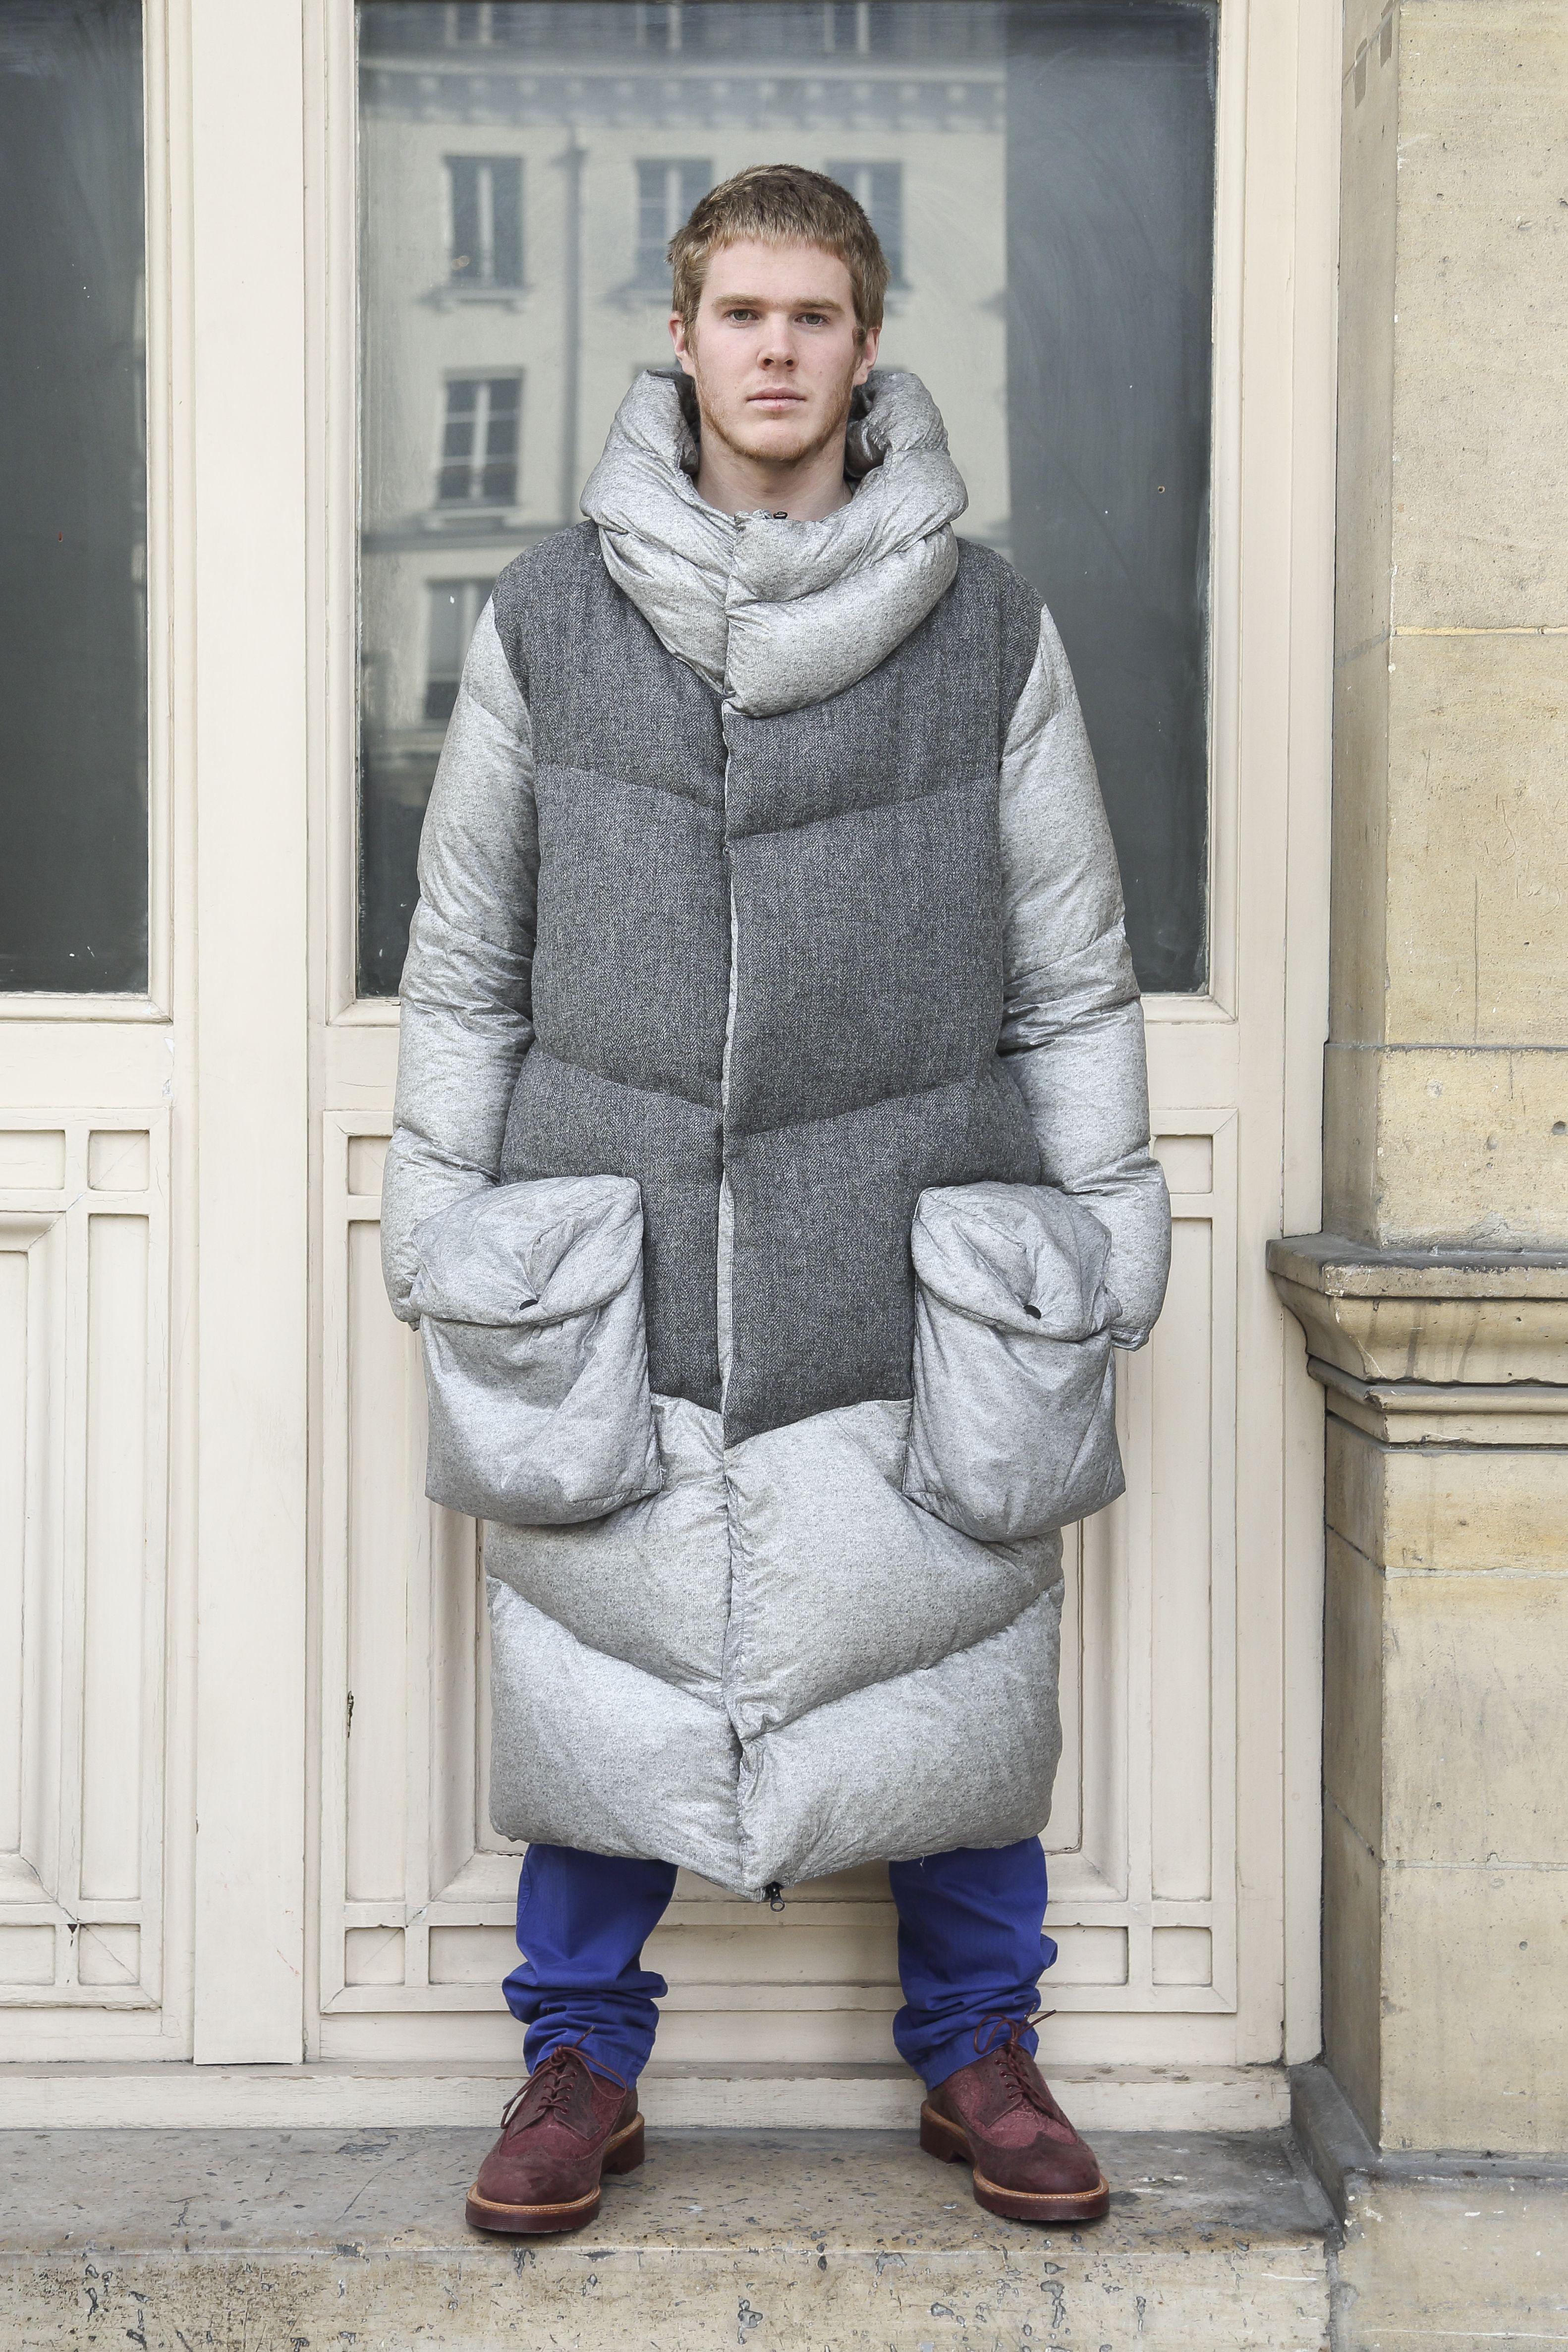 SLEEPING BAG COAT – GREY WOOL | Tailored fashion, Fashion, Coat